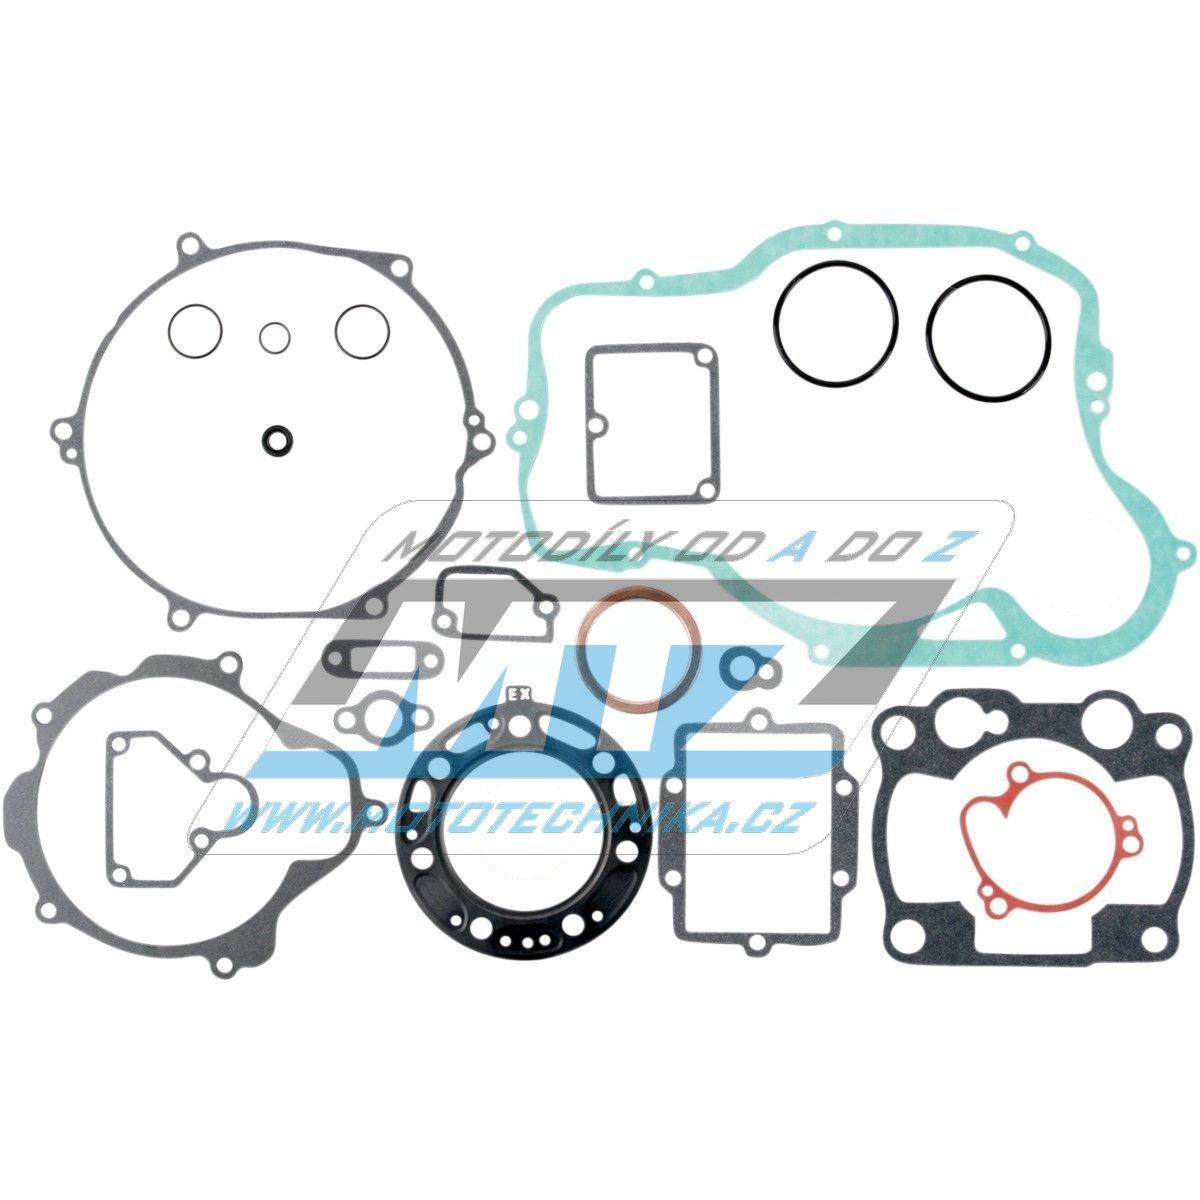 Tesnenie kompletné motor Kawasaki KX250 / 93-03 MTZ